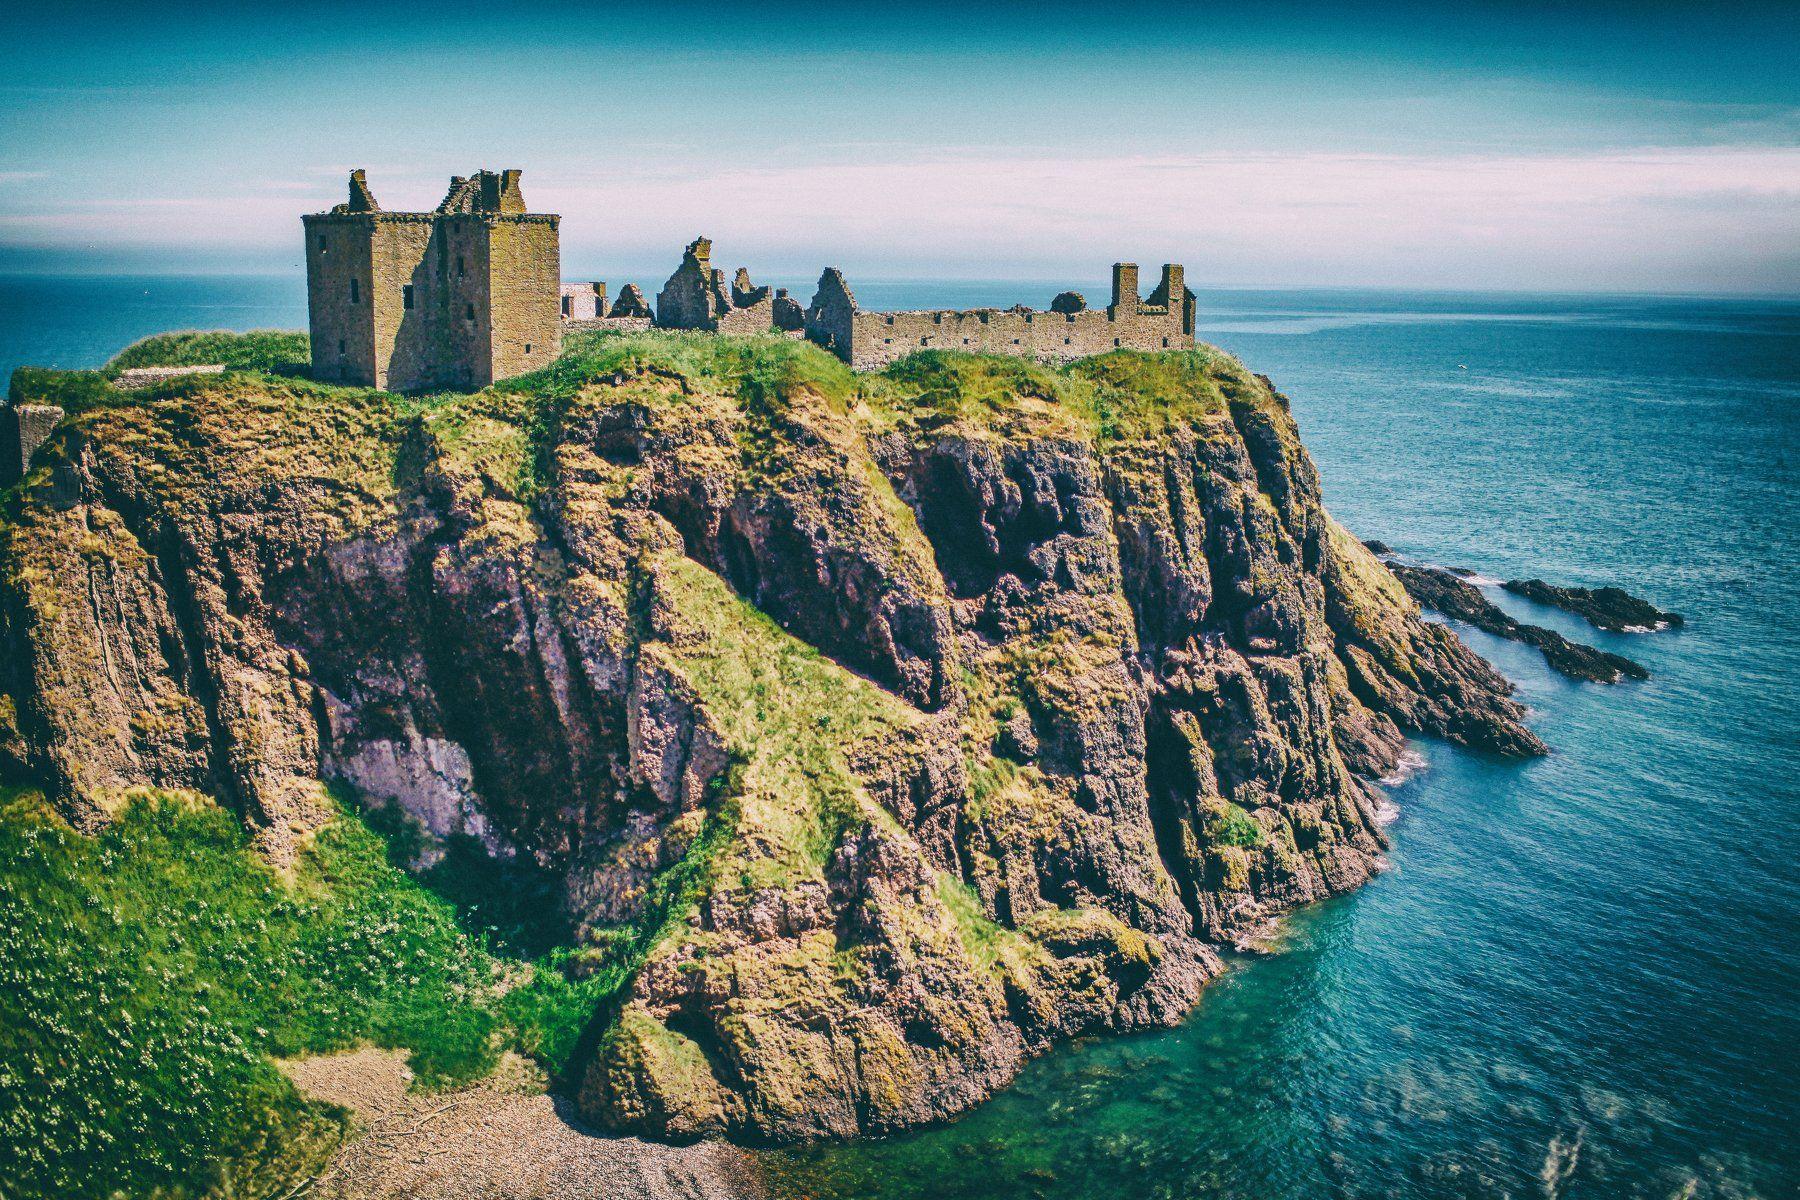 Dunnotar Castle Scotland, Lilia Tkachenko